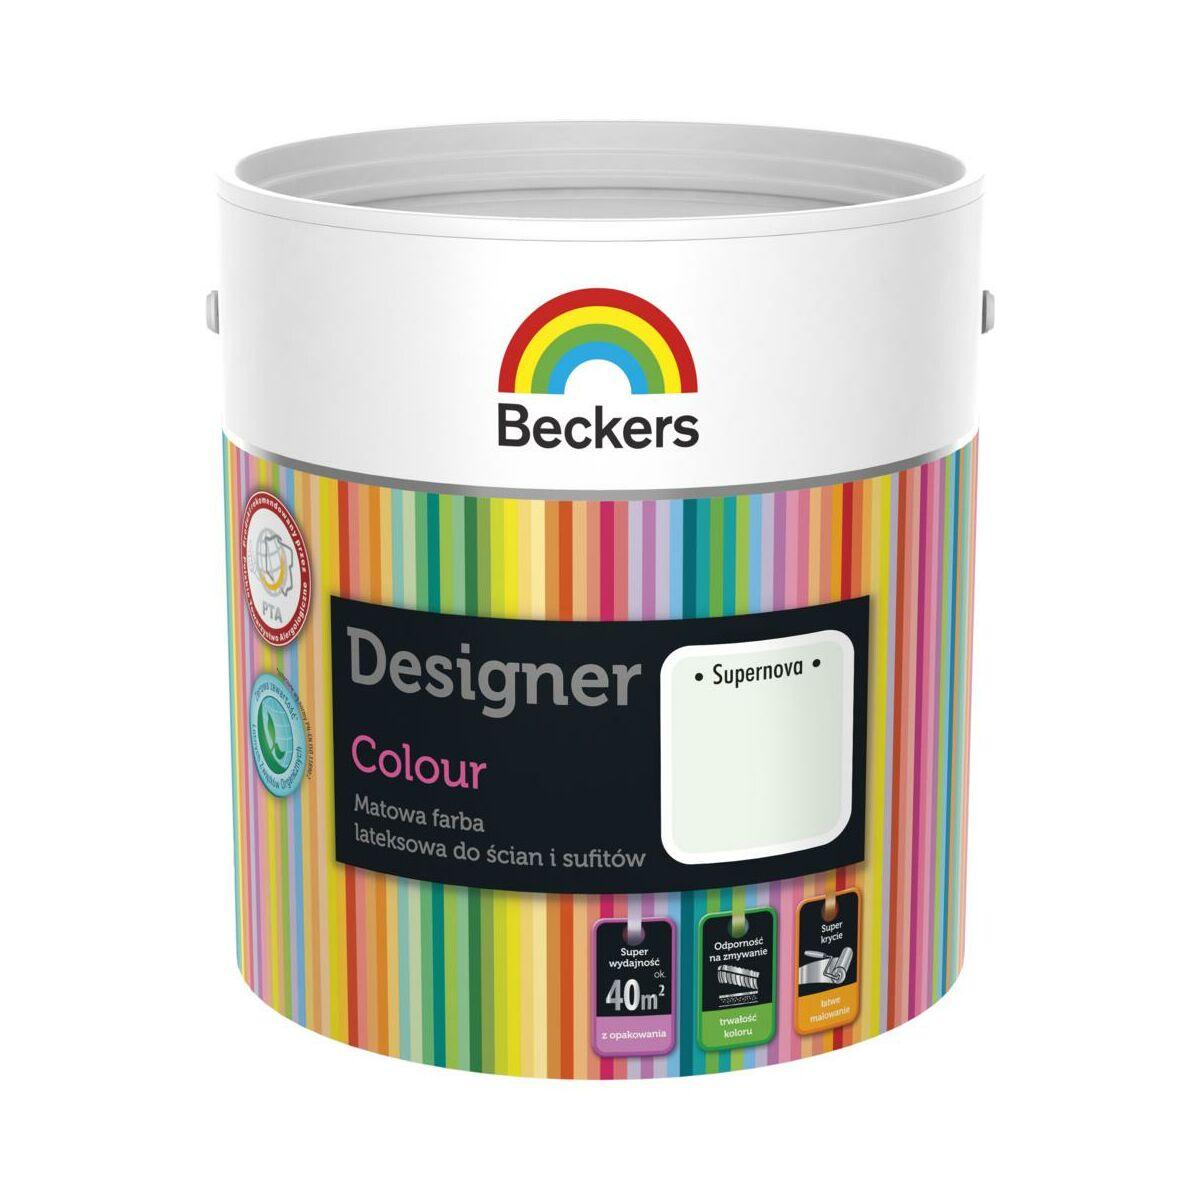 Farba Wewnetrzna Designer Colour 2 5 L Supernova Beckers Farby Scienne Kolorowe W Atrakcyjnej Cenie W Sklepach Leroy Merlin